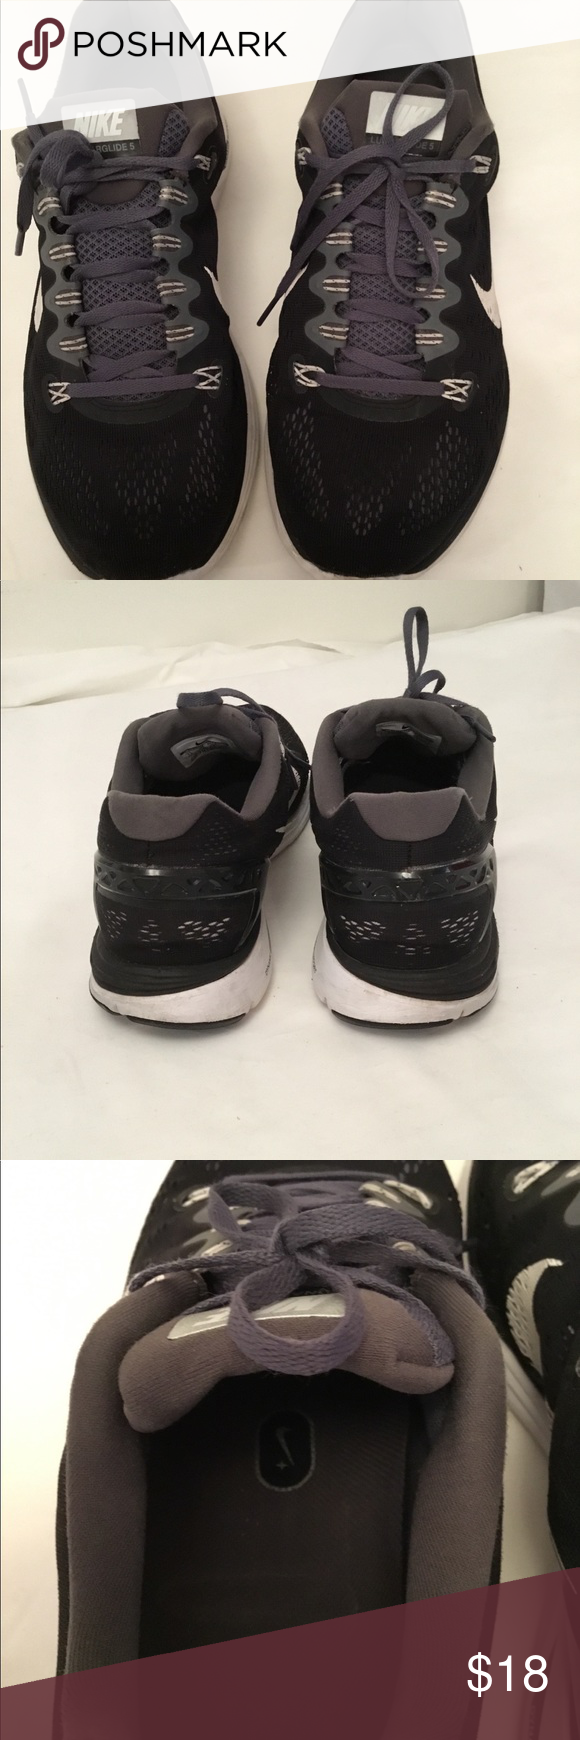 Nike Lunarglide 5 Tennis Shoes Nike Lunarglide 5 Dynamic Support Size 11 Nike  Nike Lunarglide 5 Tennis Shoes Nike Lunarglide 5 Dynamic Support Size 11 Nike